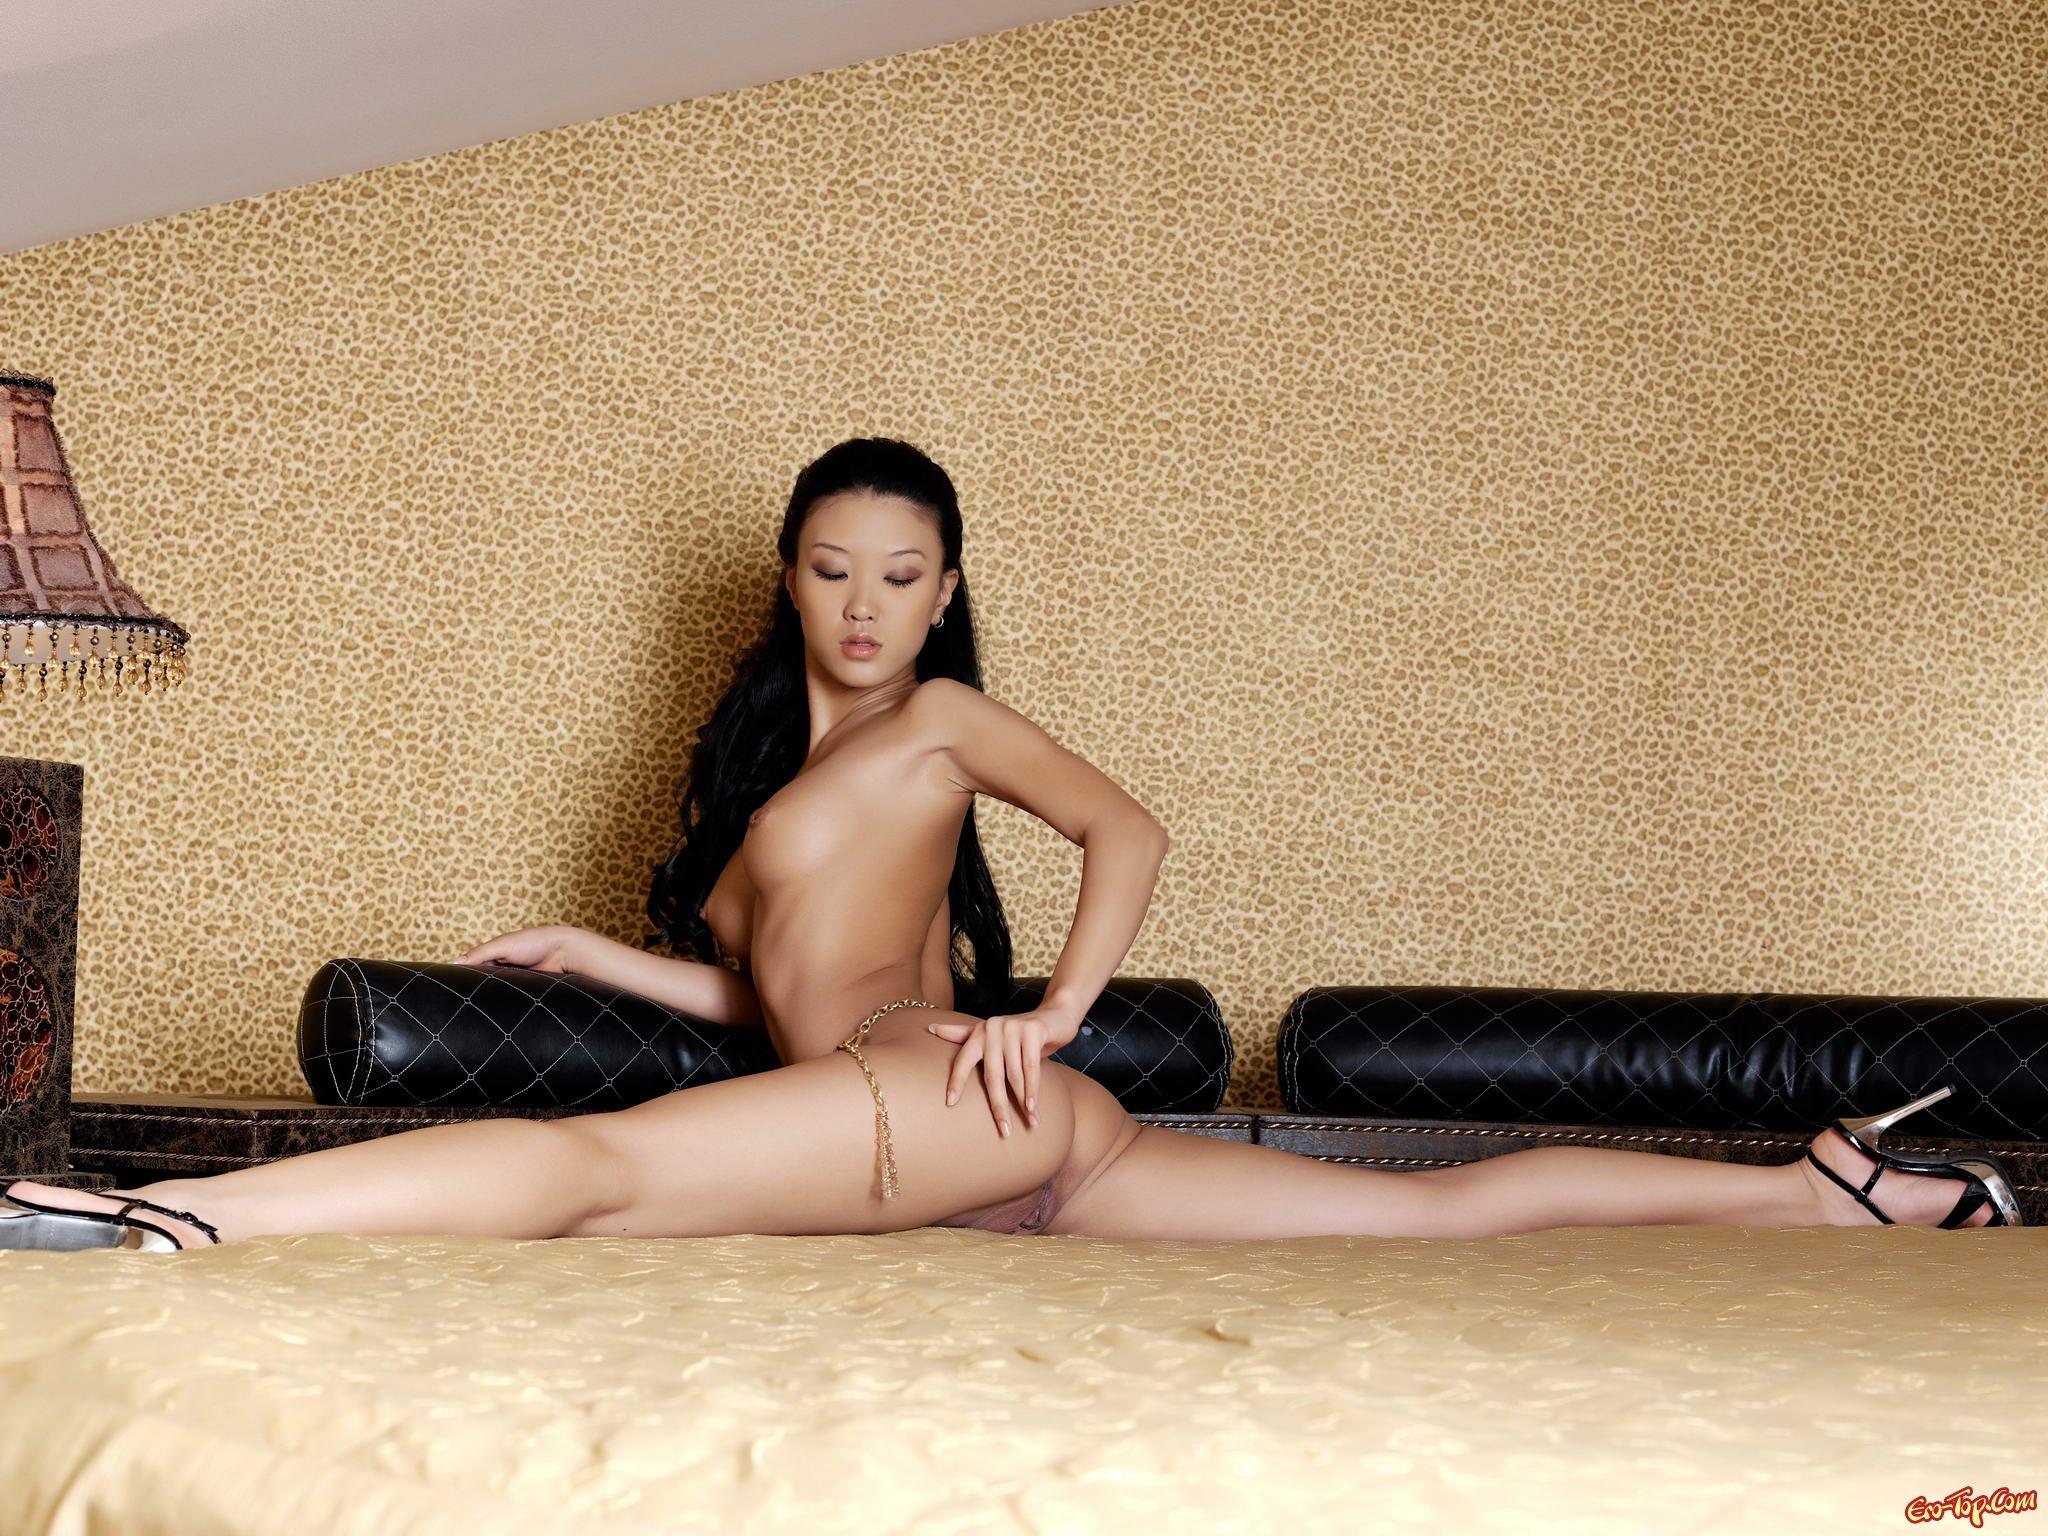 Азиатка на шпагате порно